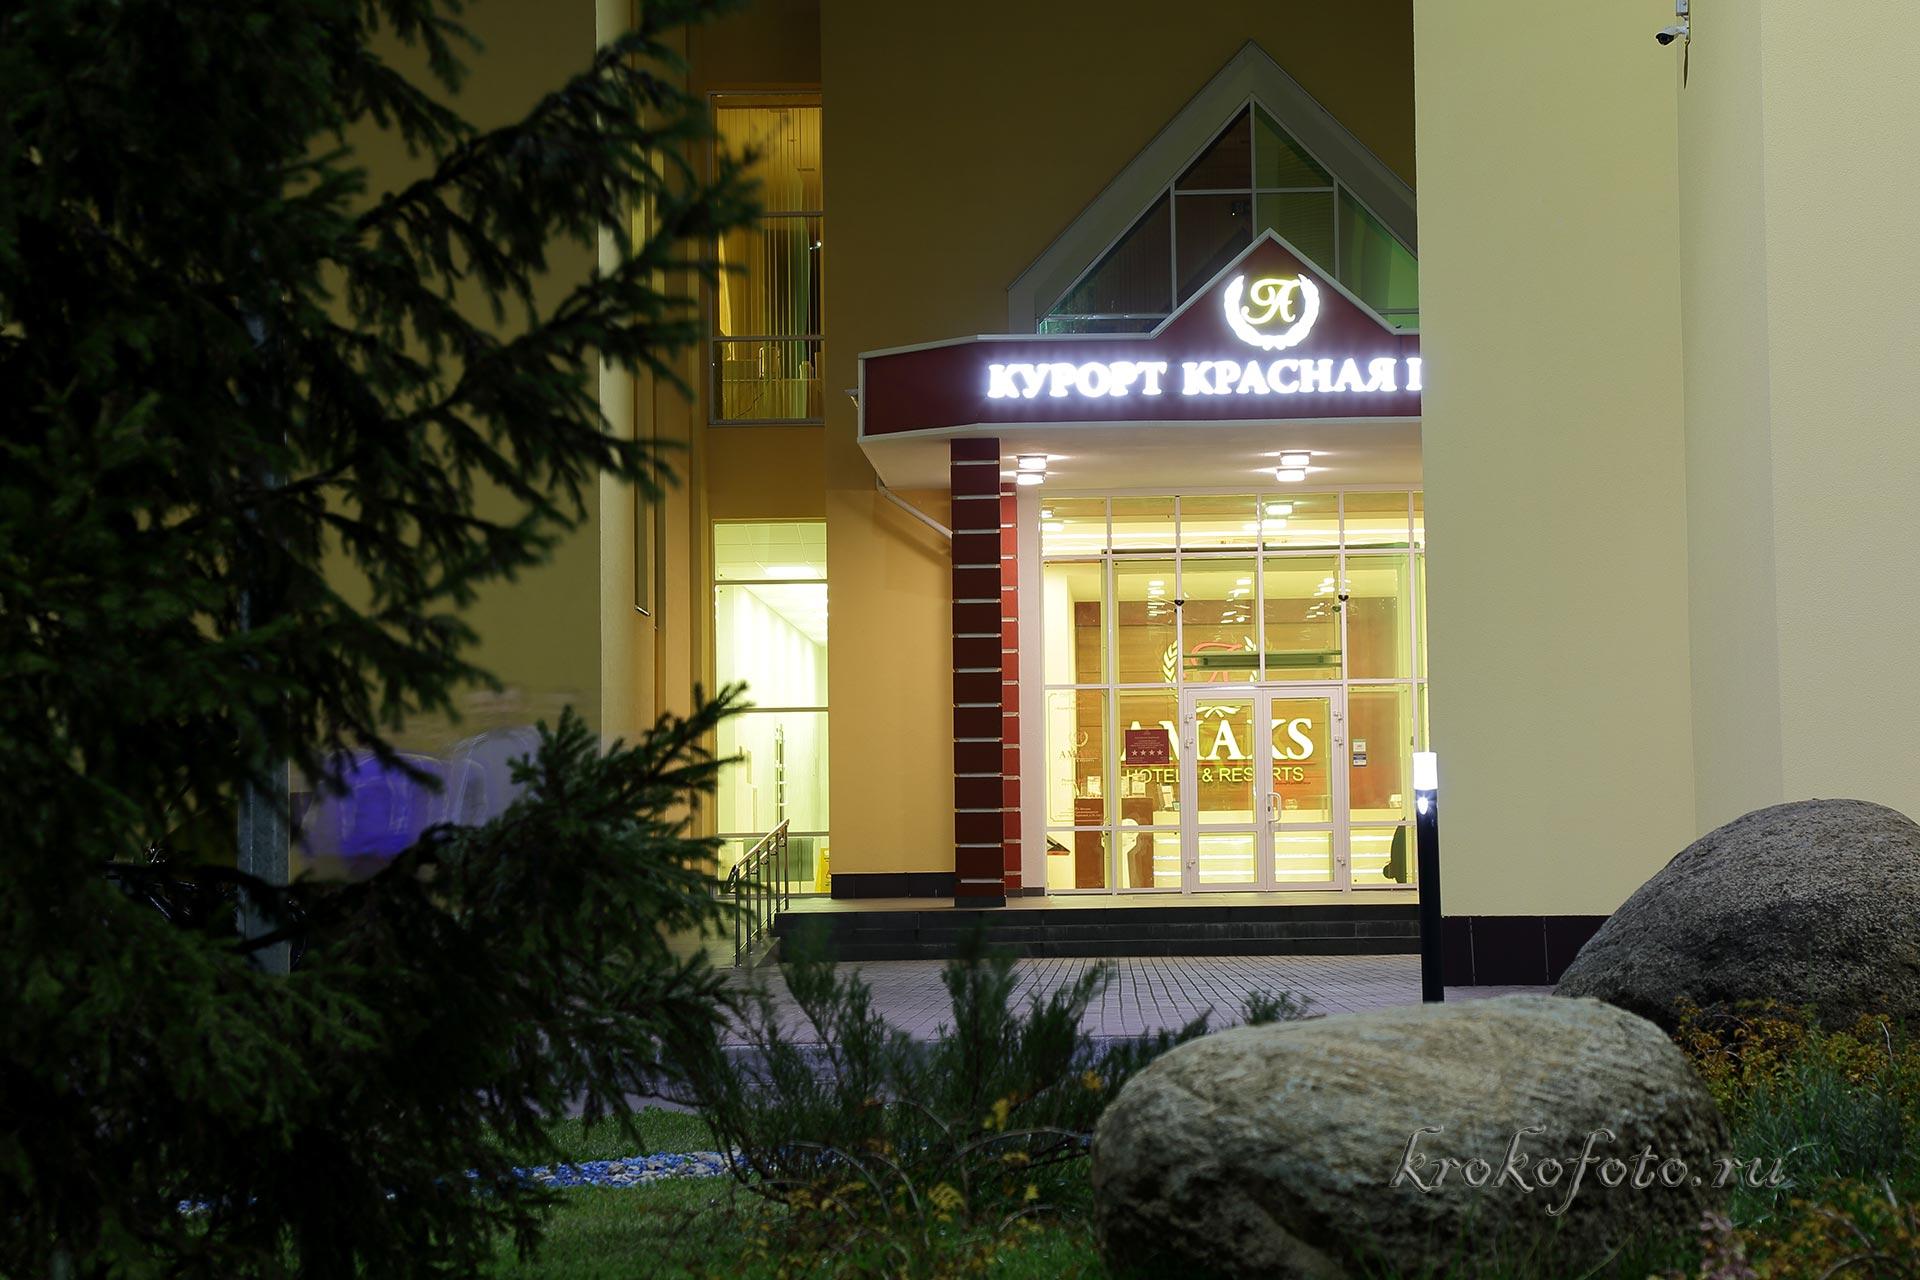 krasnaya-paxra-2